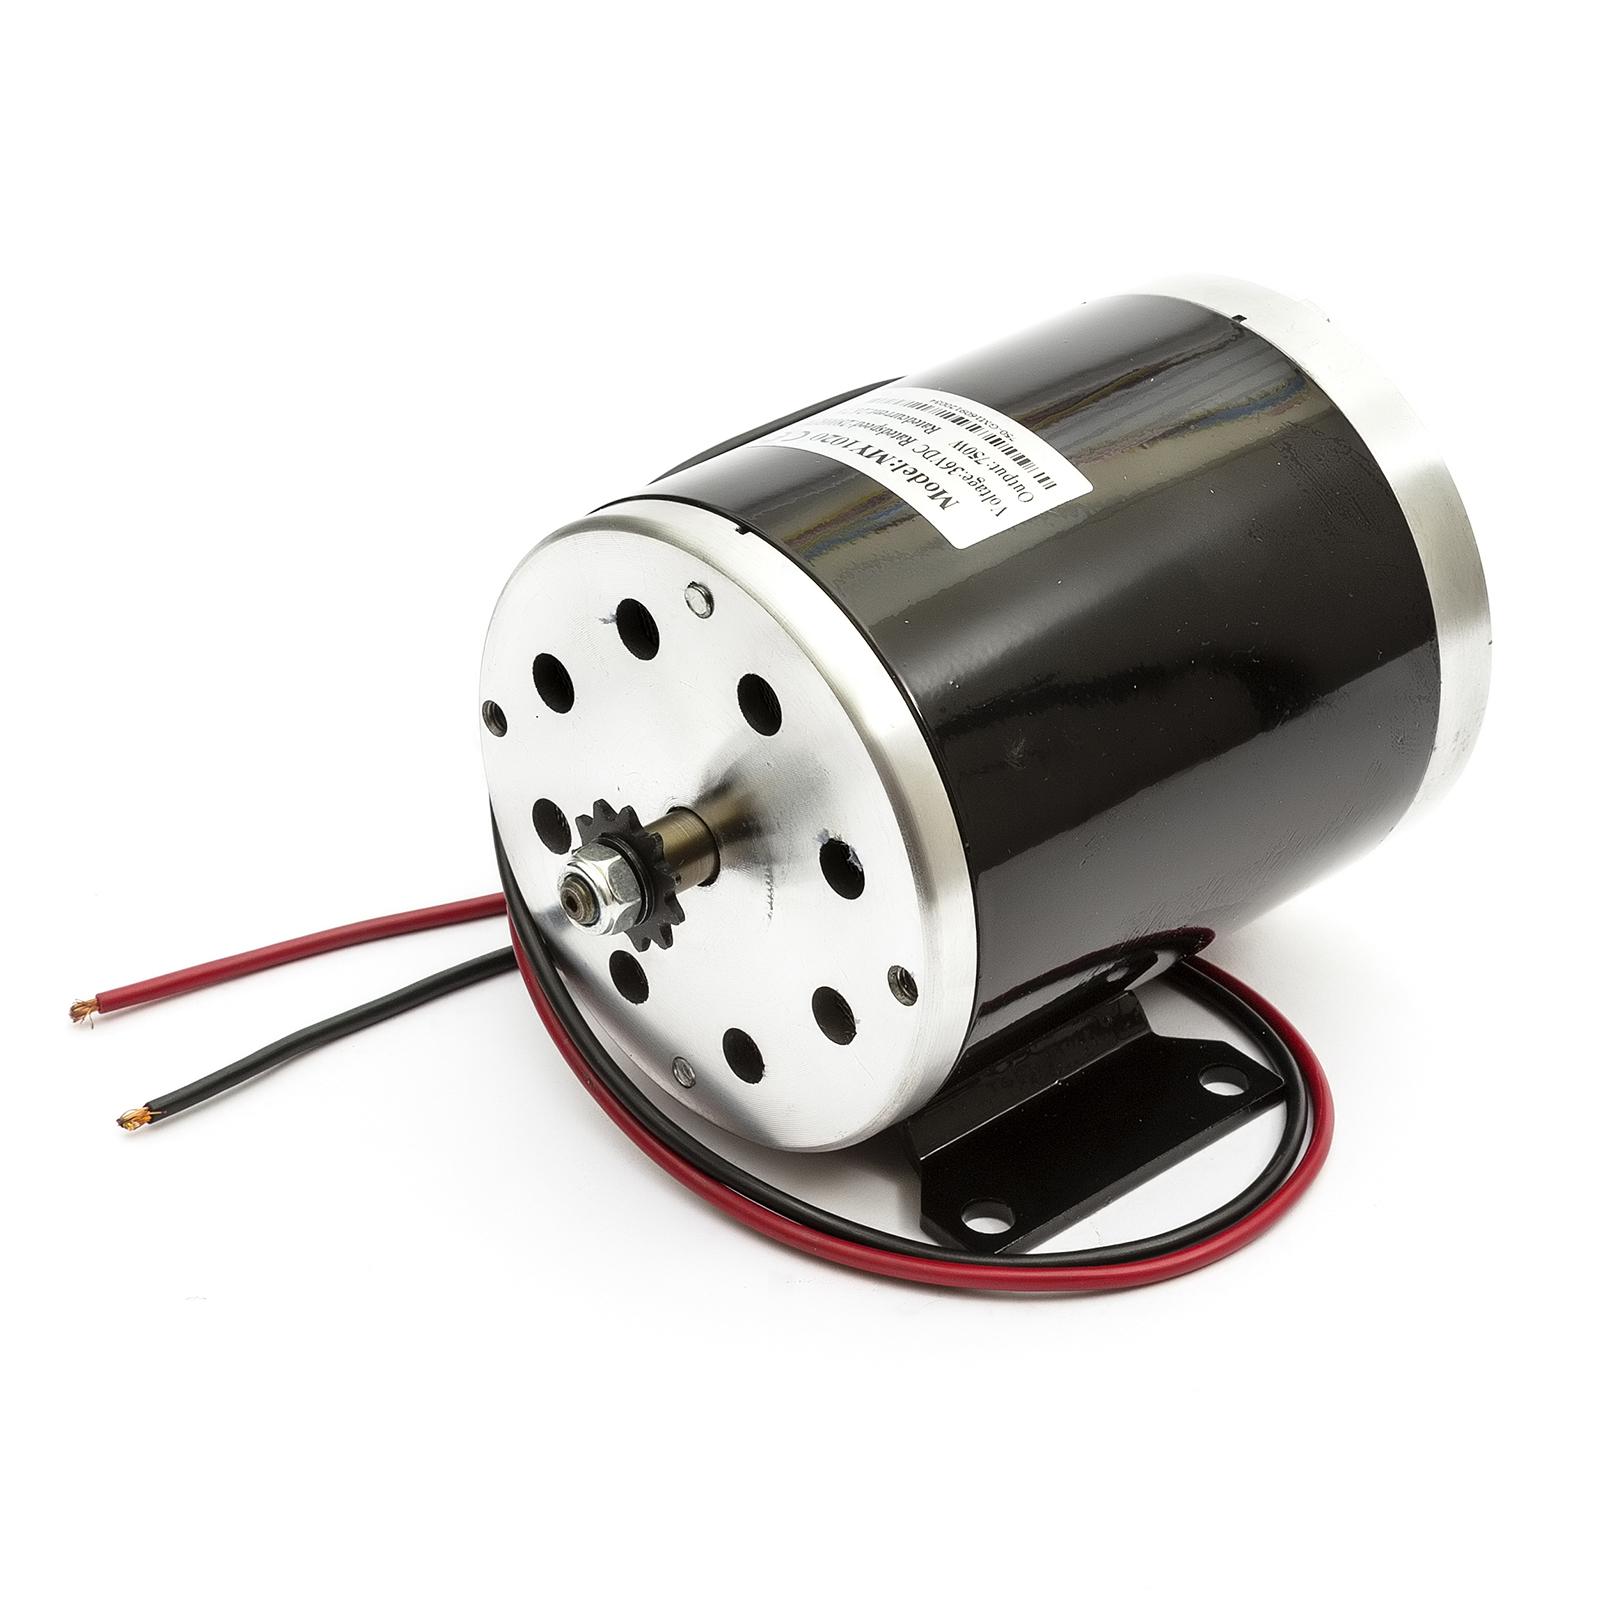 HMParts E Scooter RC Elektro Motor mit Halter 48V 500W MY1020